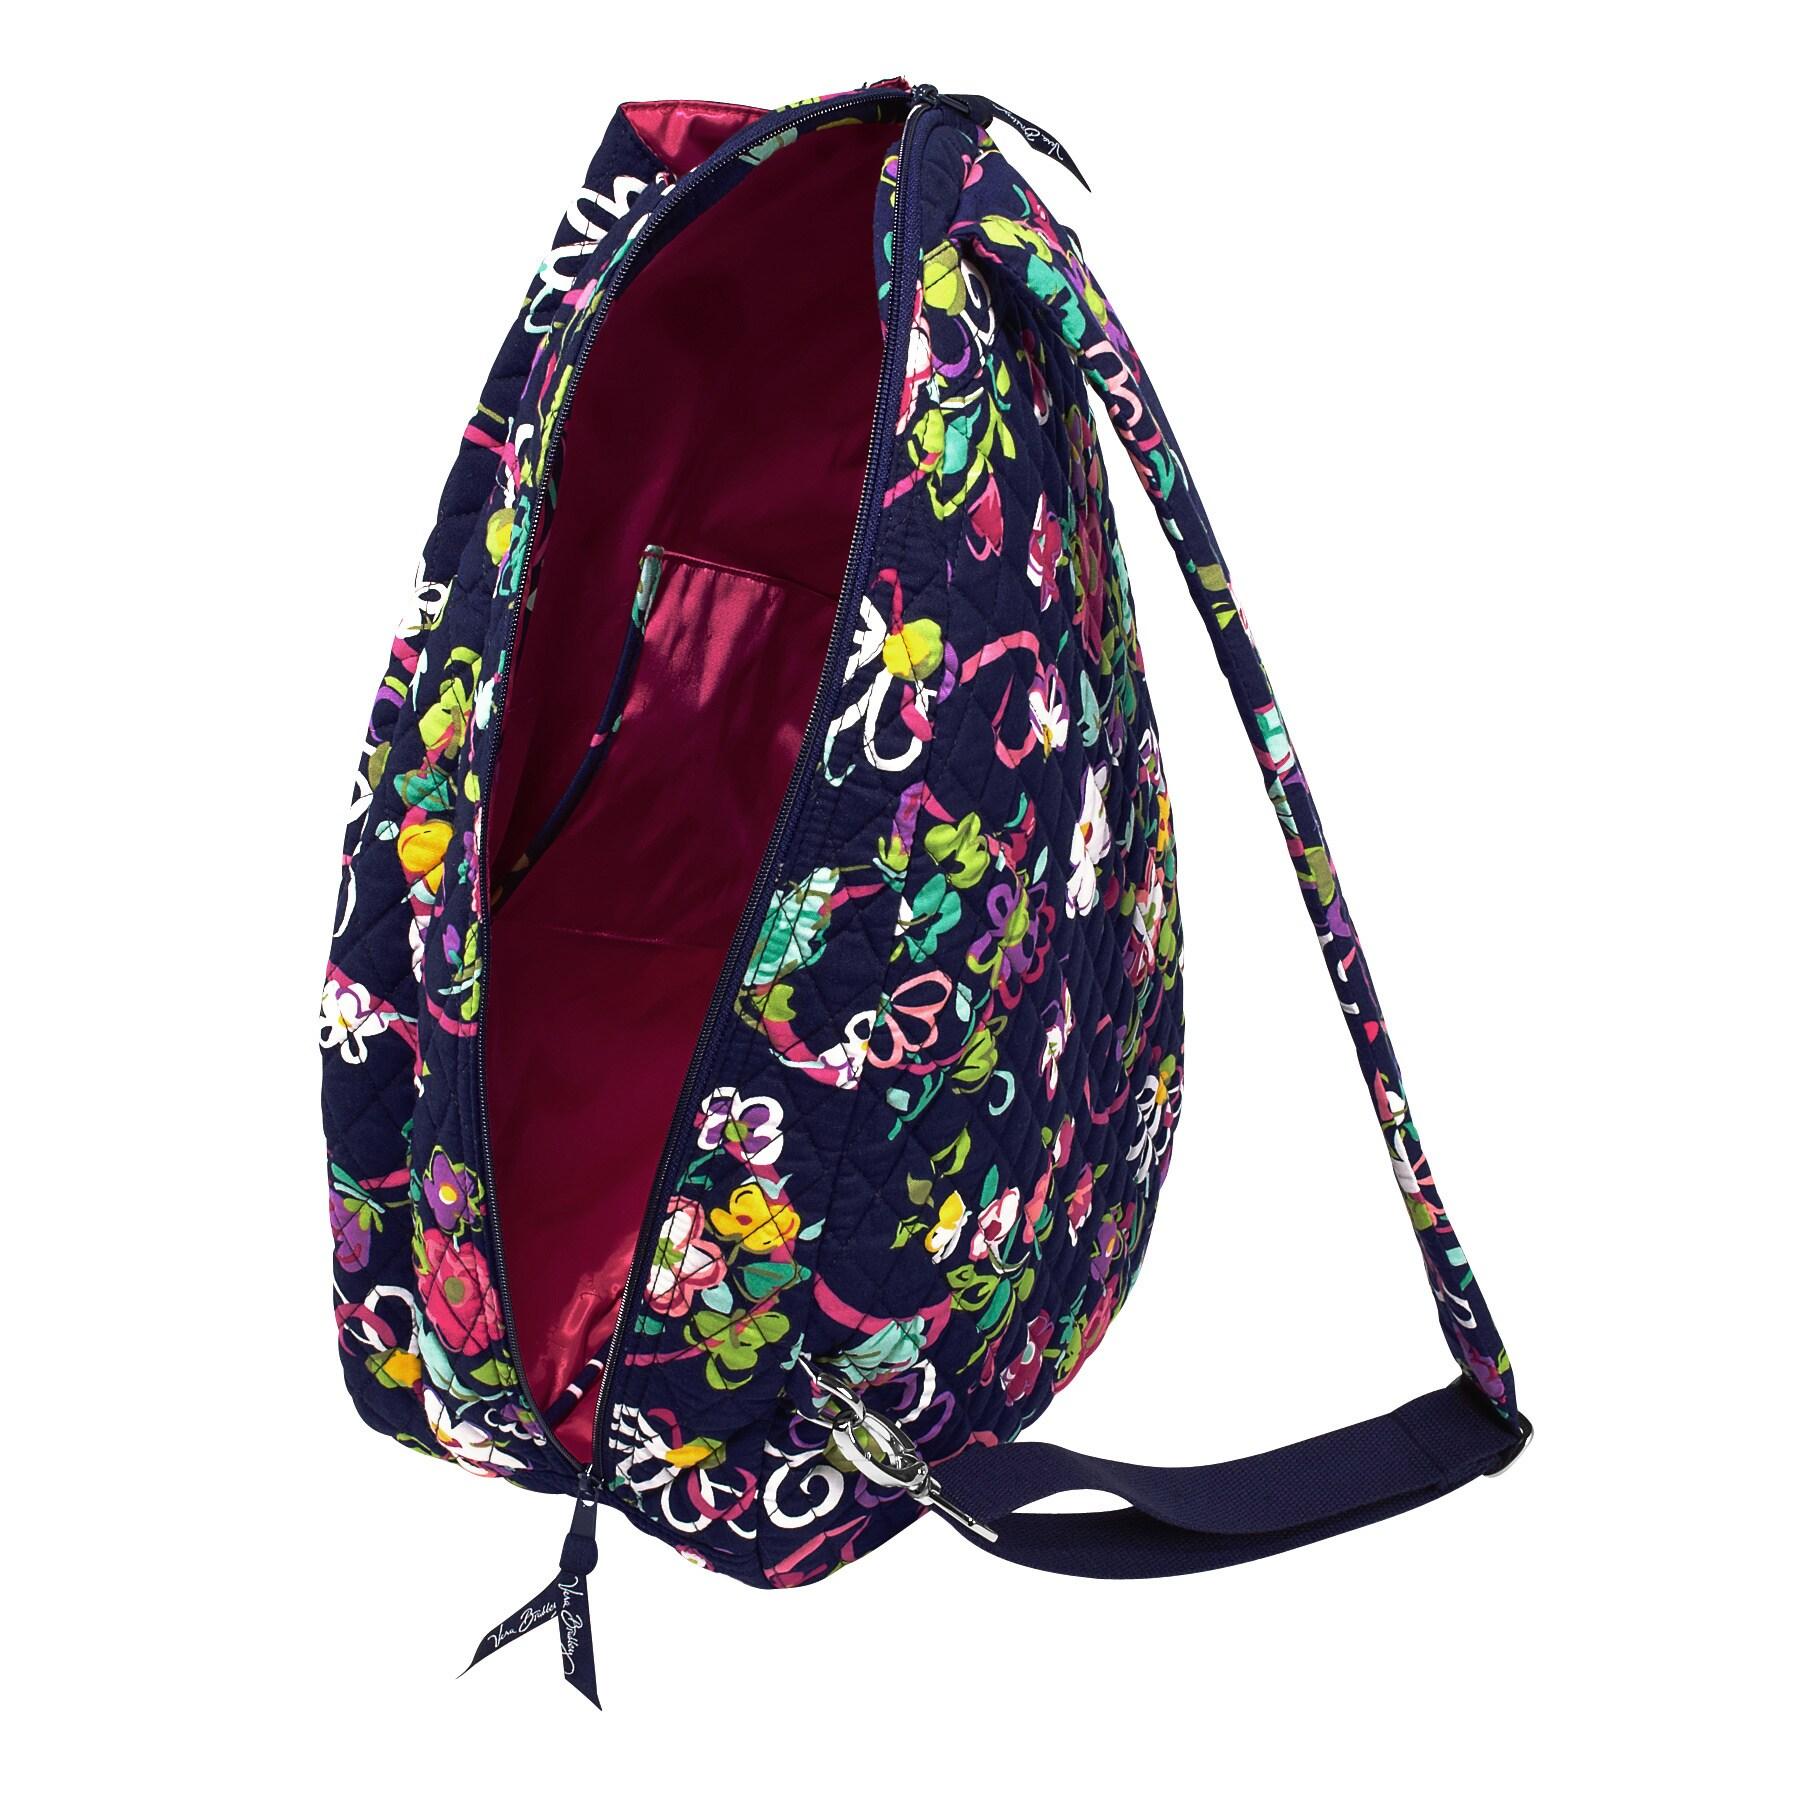 Vera Bradley Ribbons Sling Tennis Backpack Shoulder Bag Free Shipping On Orders Over 45 9376085